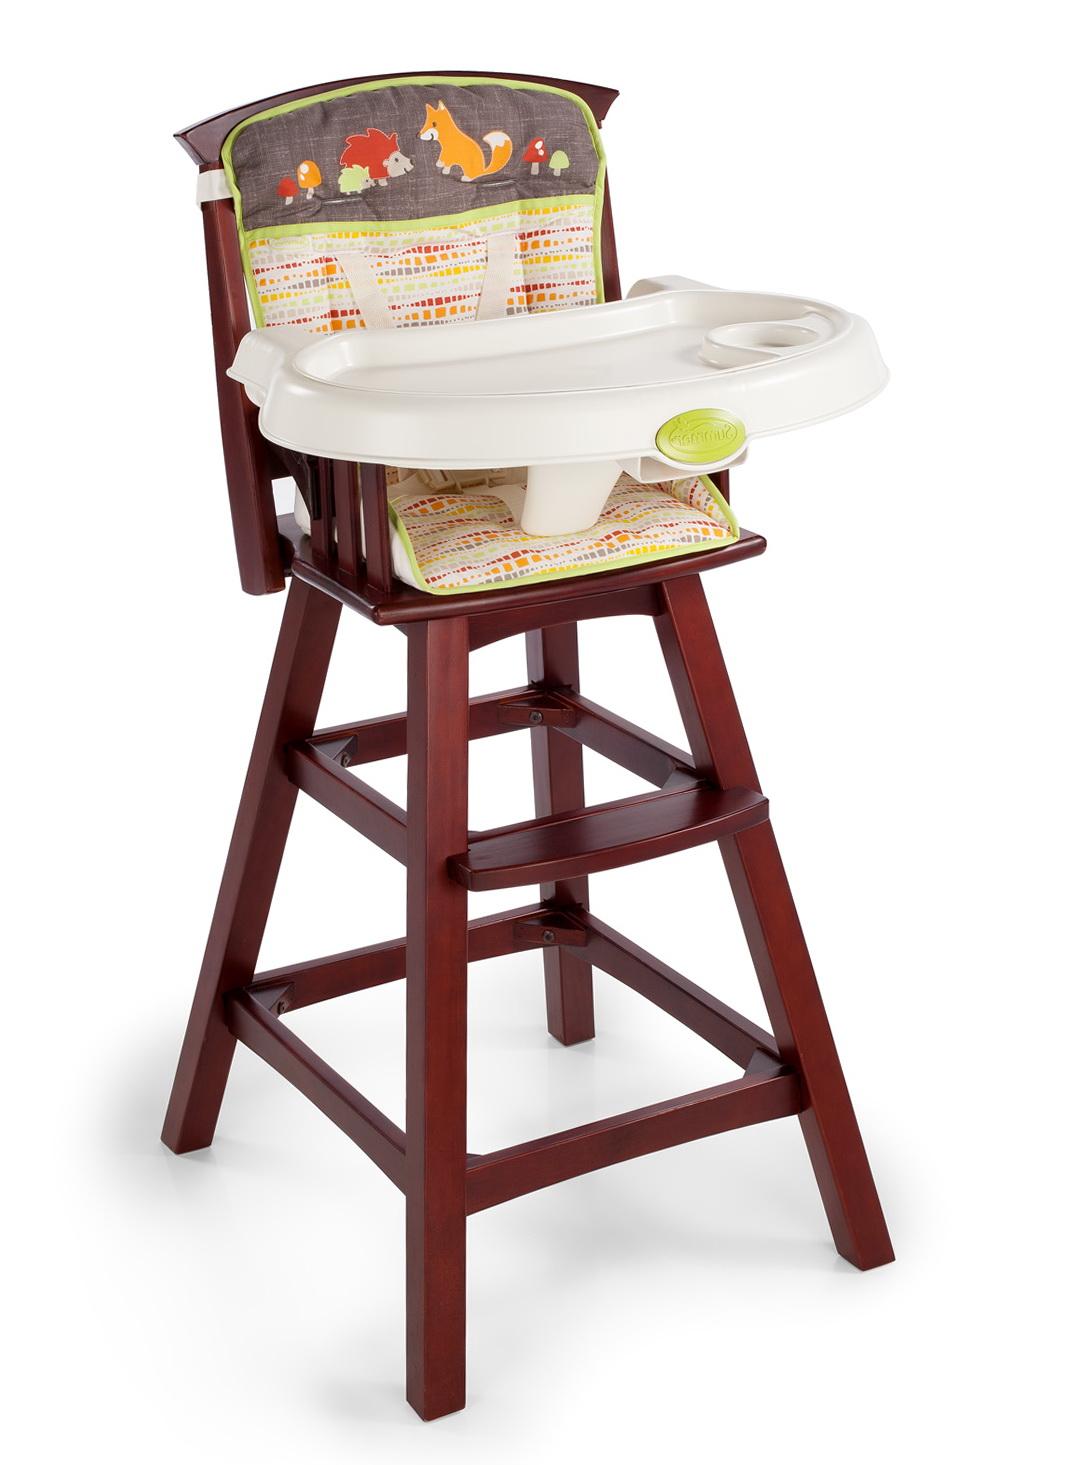 Wooden High Chair Canada